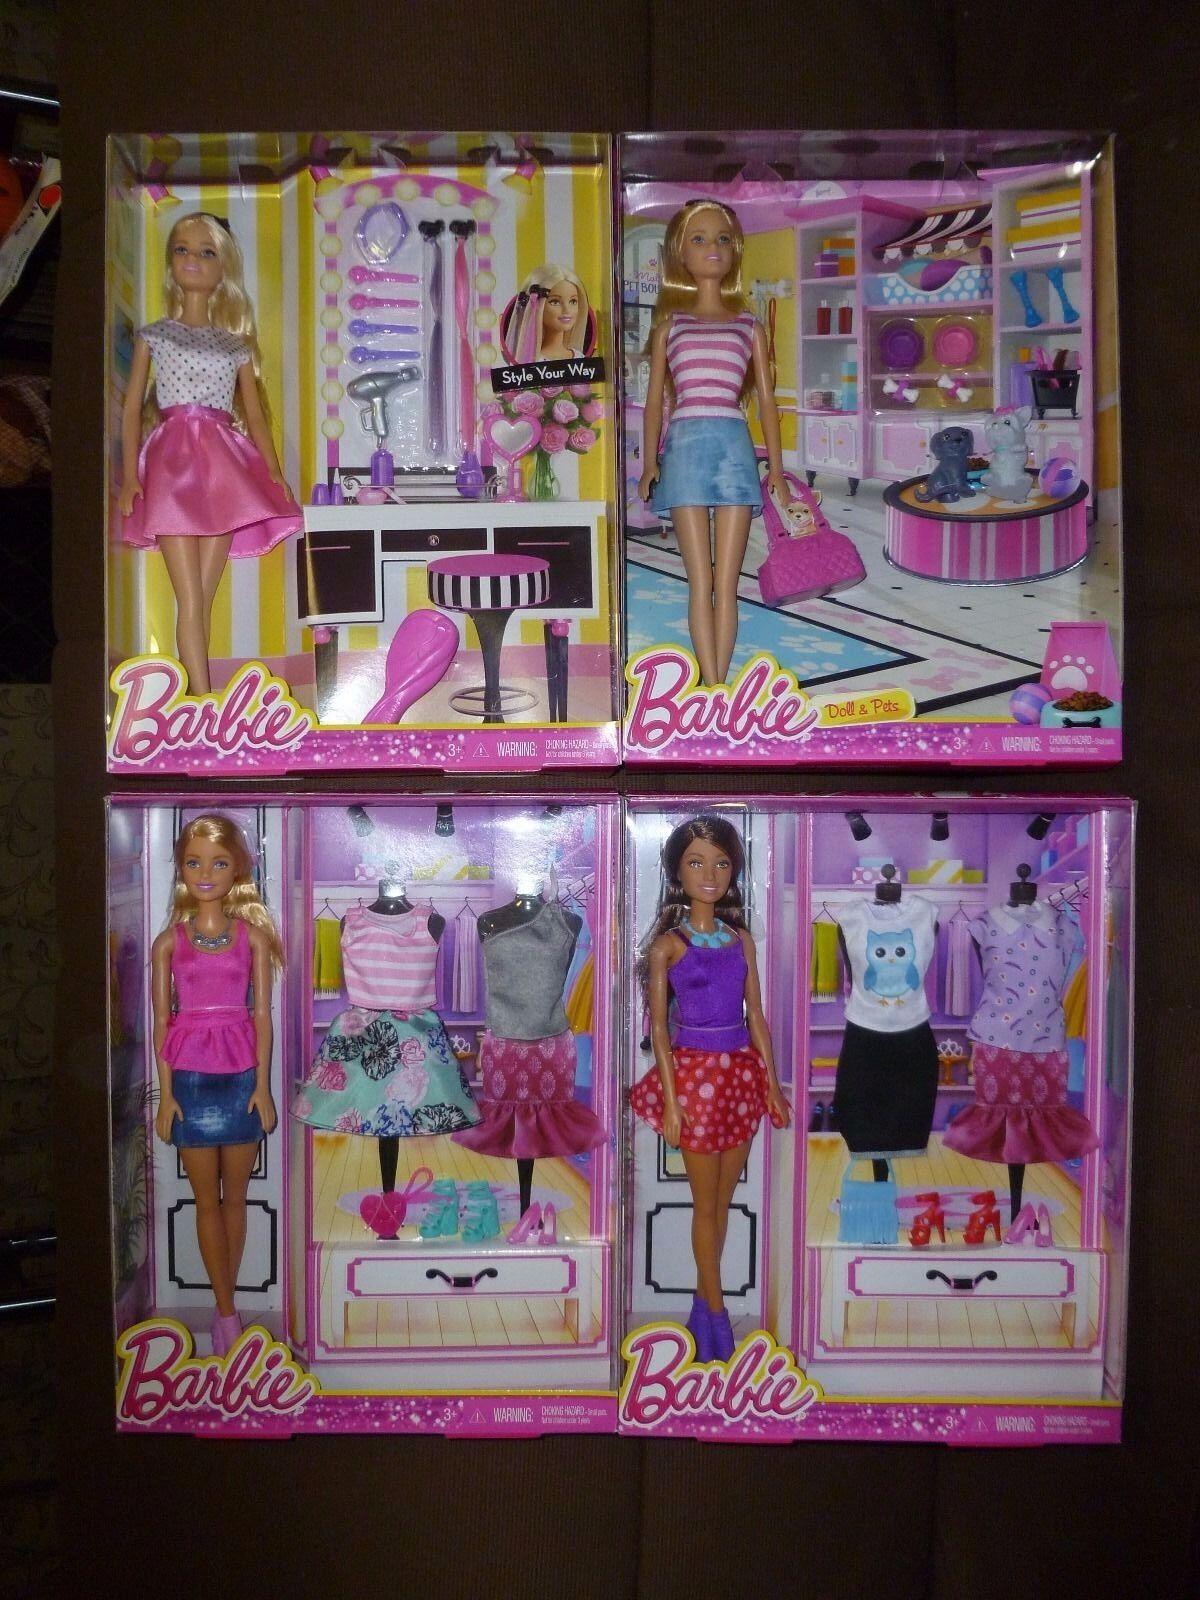 Muñecas Barbie Mascota & Juego De Accesorios De Moda Colección Limited Edition